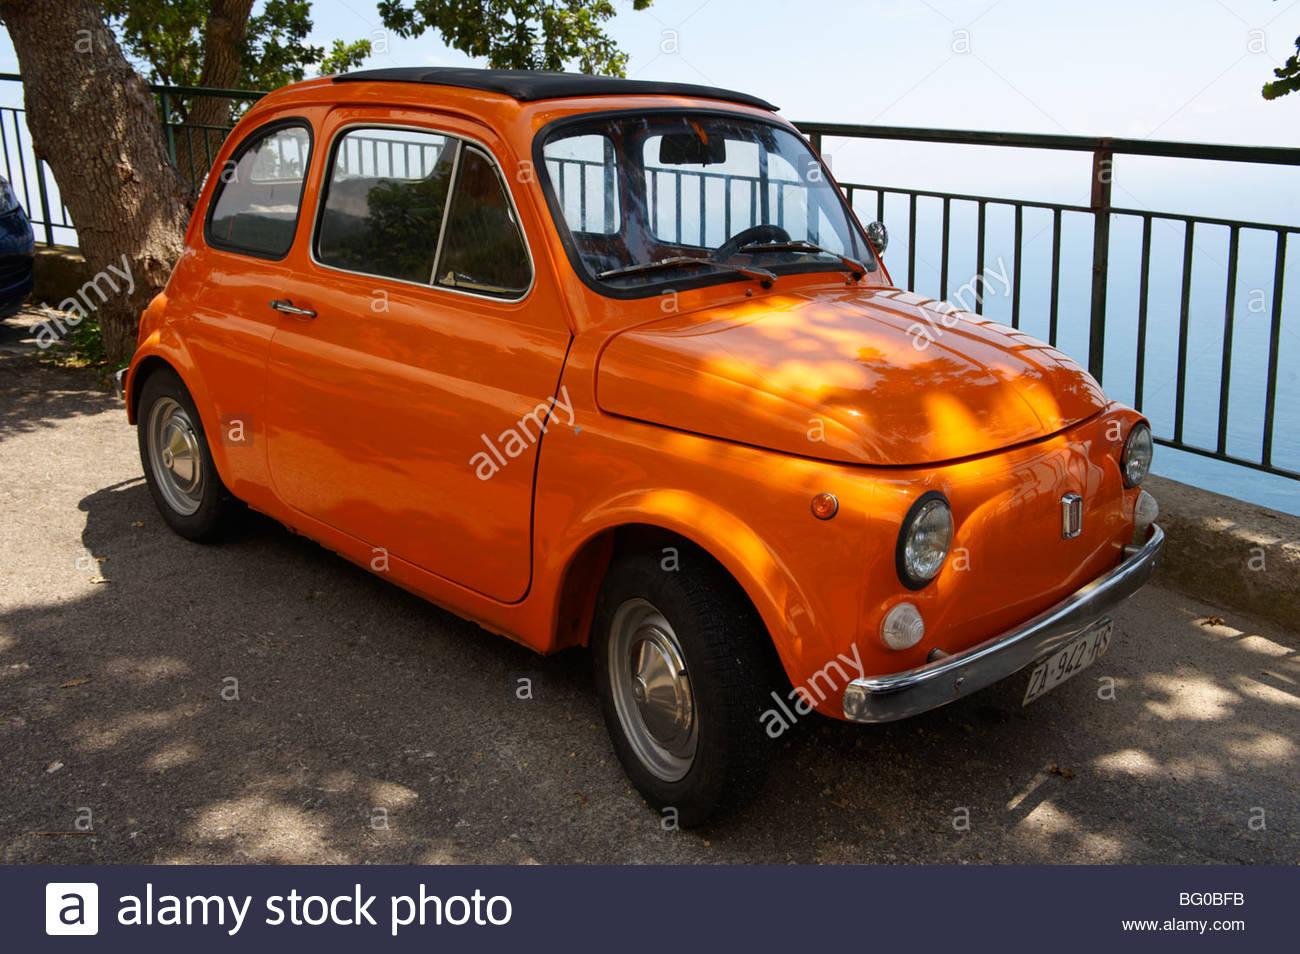 Fiat 500, Italy - Stock Image